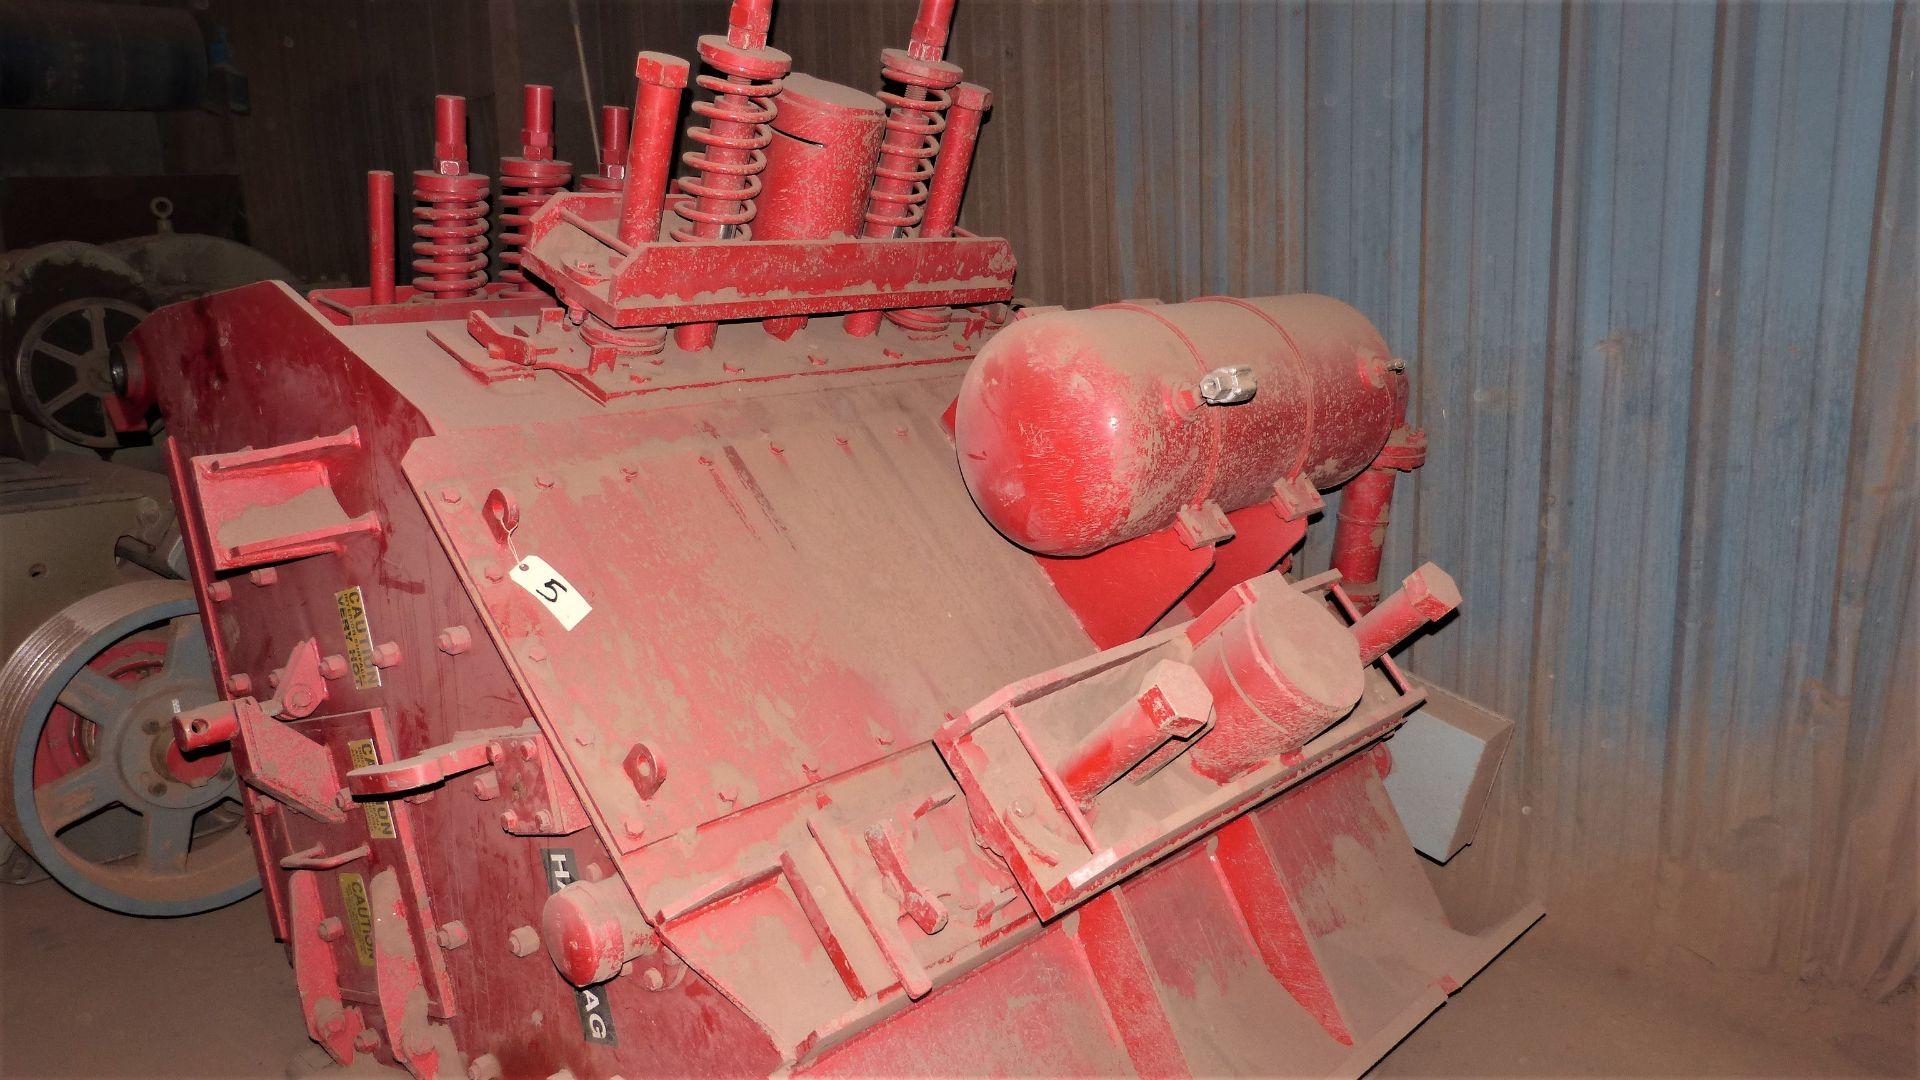 HAZEMAG IMPACT CRUSHER, MODEL 1315, 60'' DIAMETER ROTOR, 60'' WIDE, 575V, 450 HP - Image 20 of 25